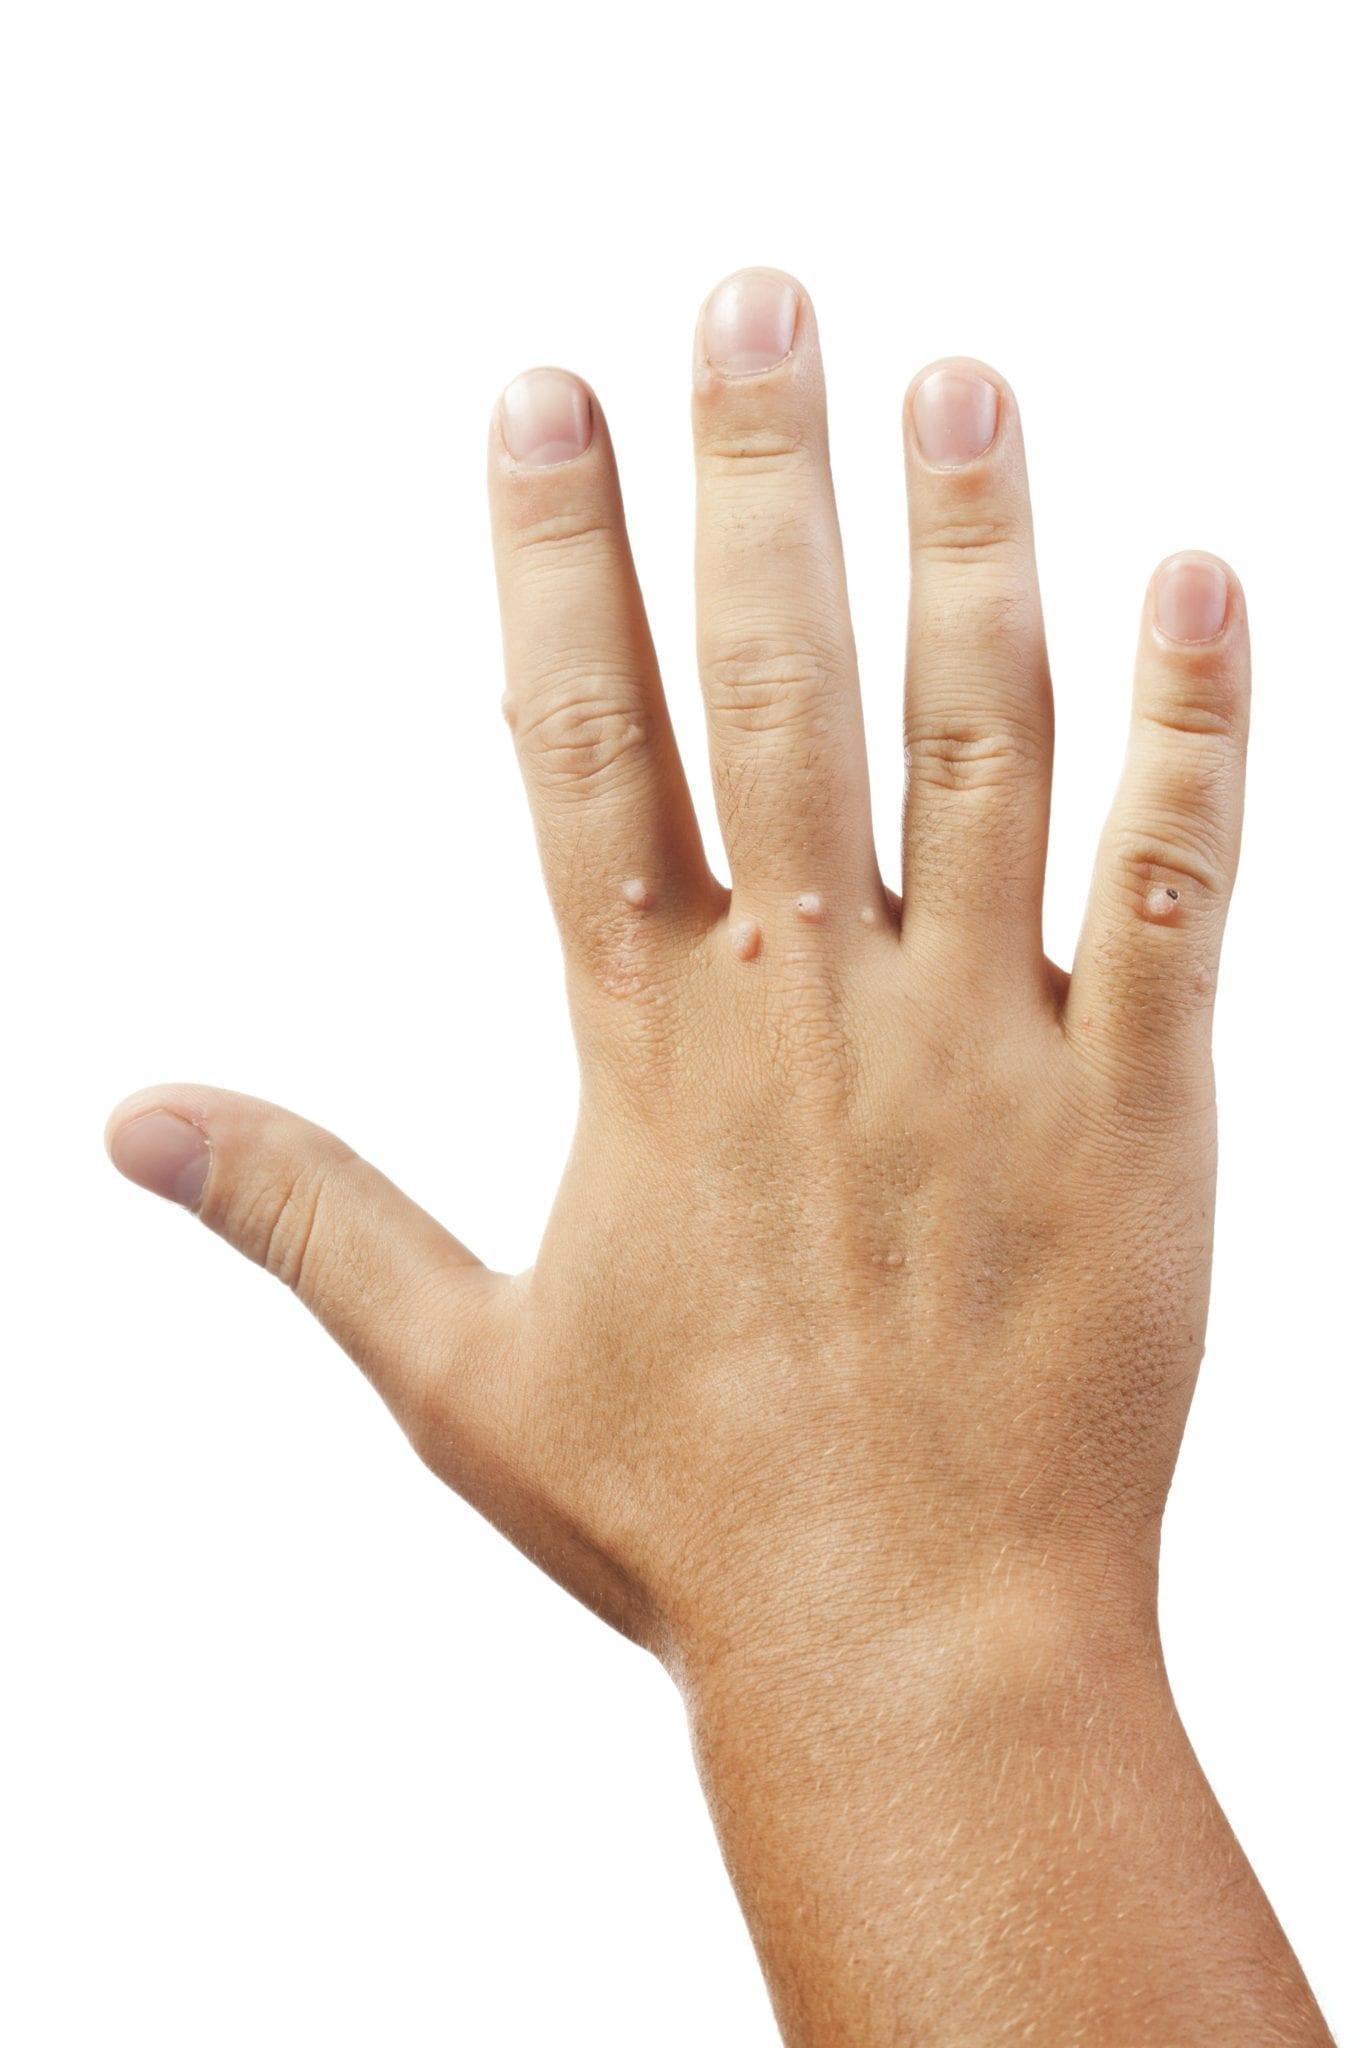 warts on hands painful cancer de prostata diagnostico